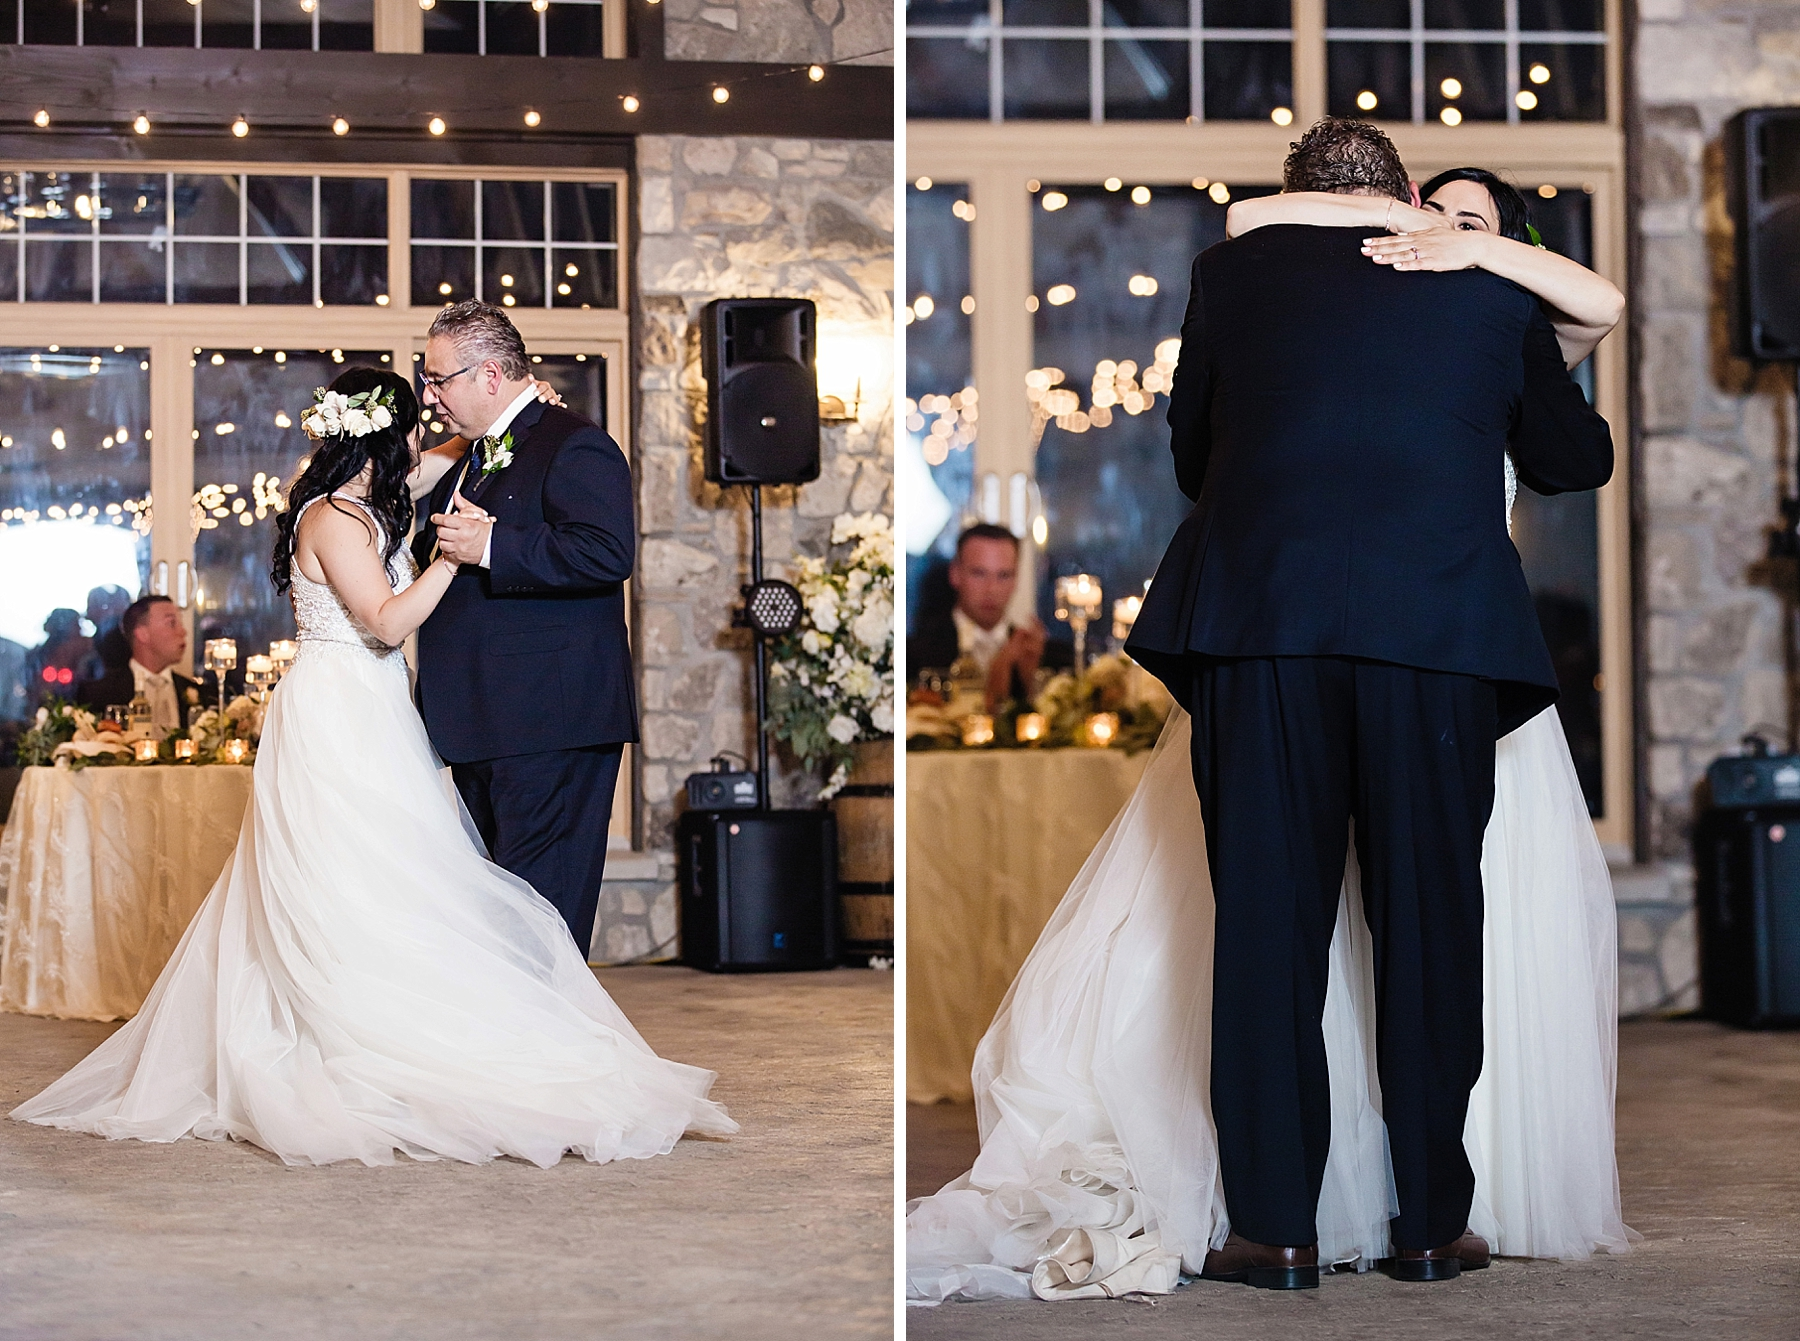 windsor-wedding-photographer-sprucewood-shores-winery-wedding-niagara-on-the-lake-wedding-photographer-eryn-shea-photography_0091.jpg